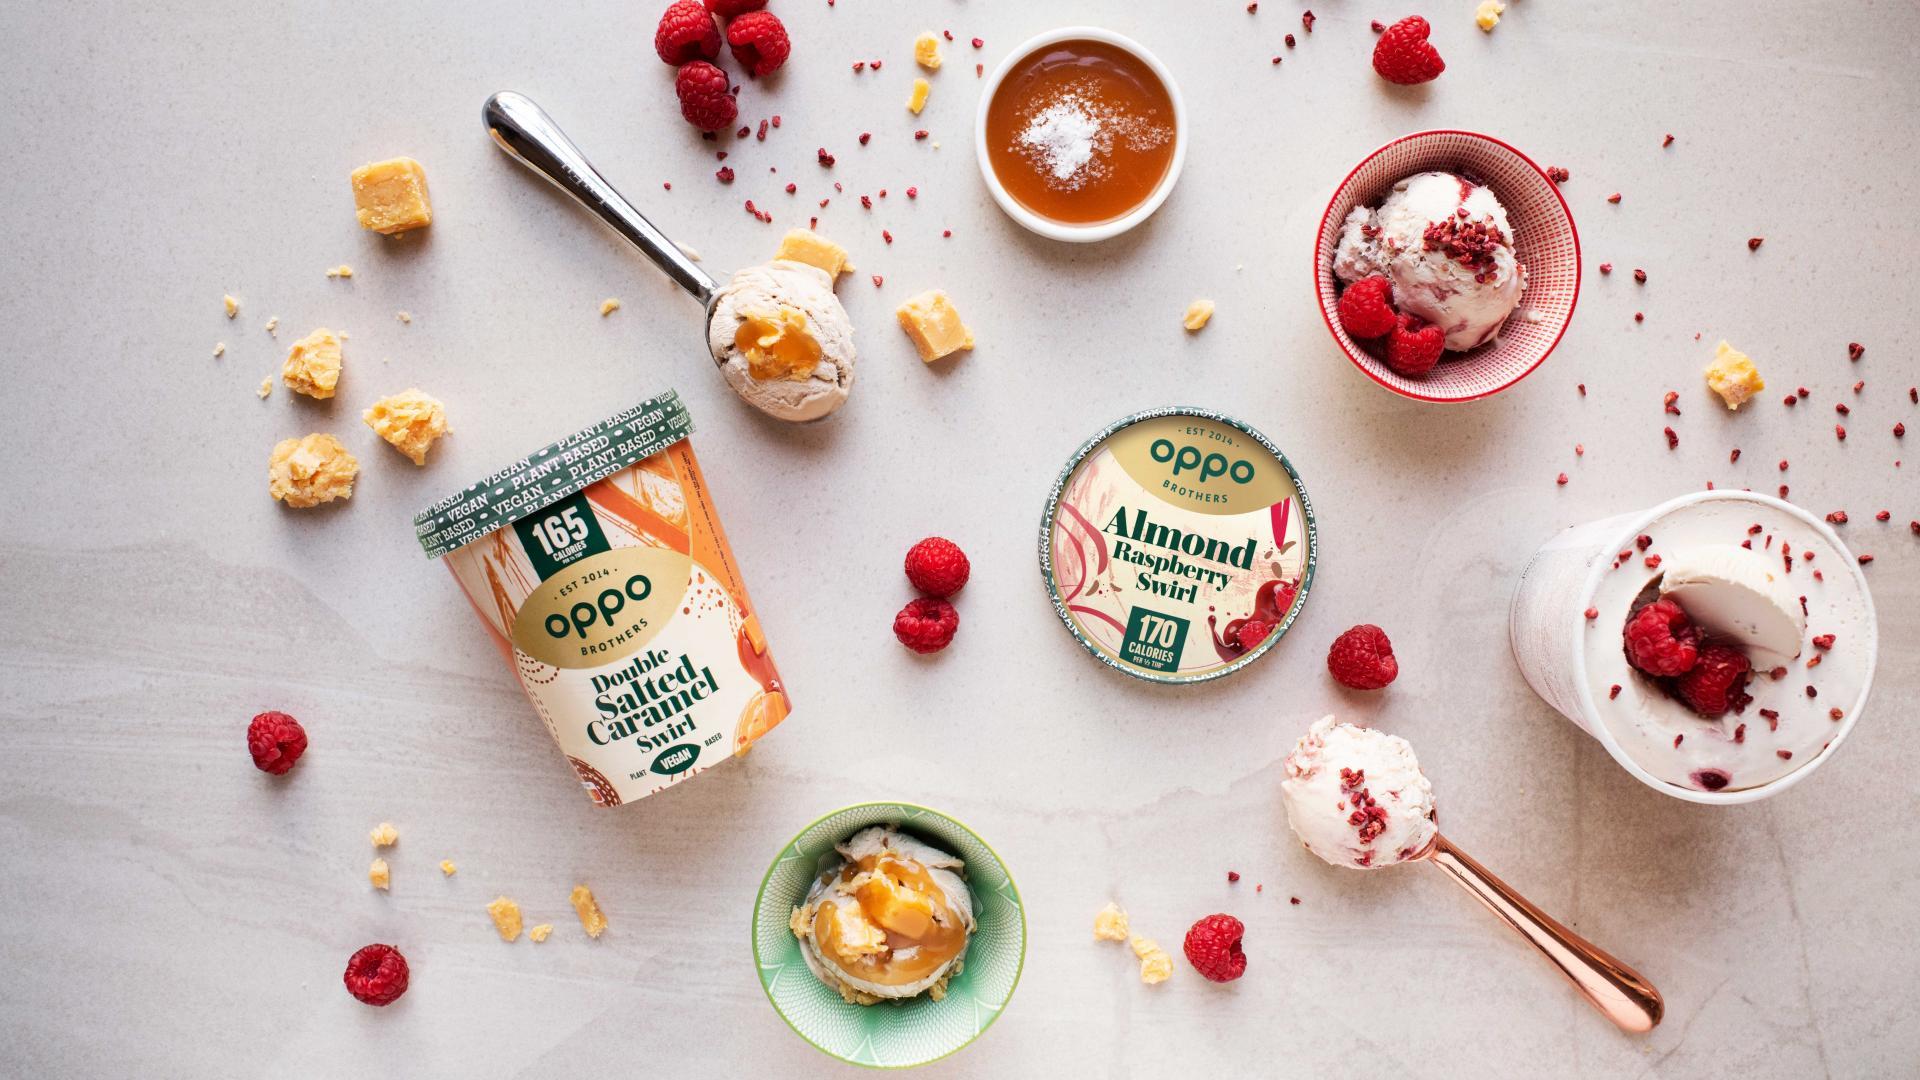 Supermarket ice creams: Oppo